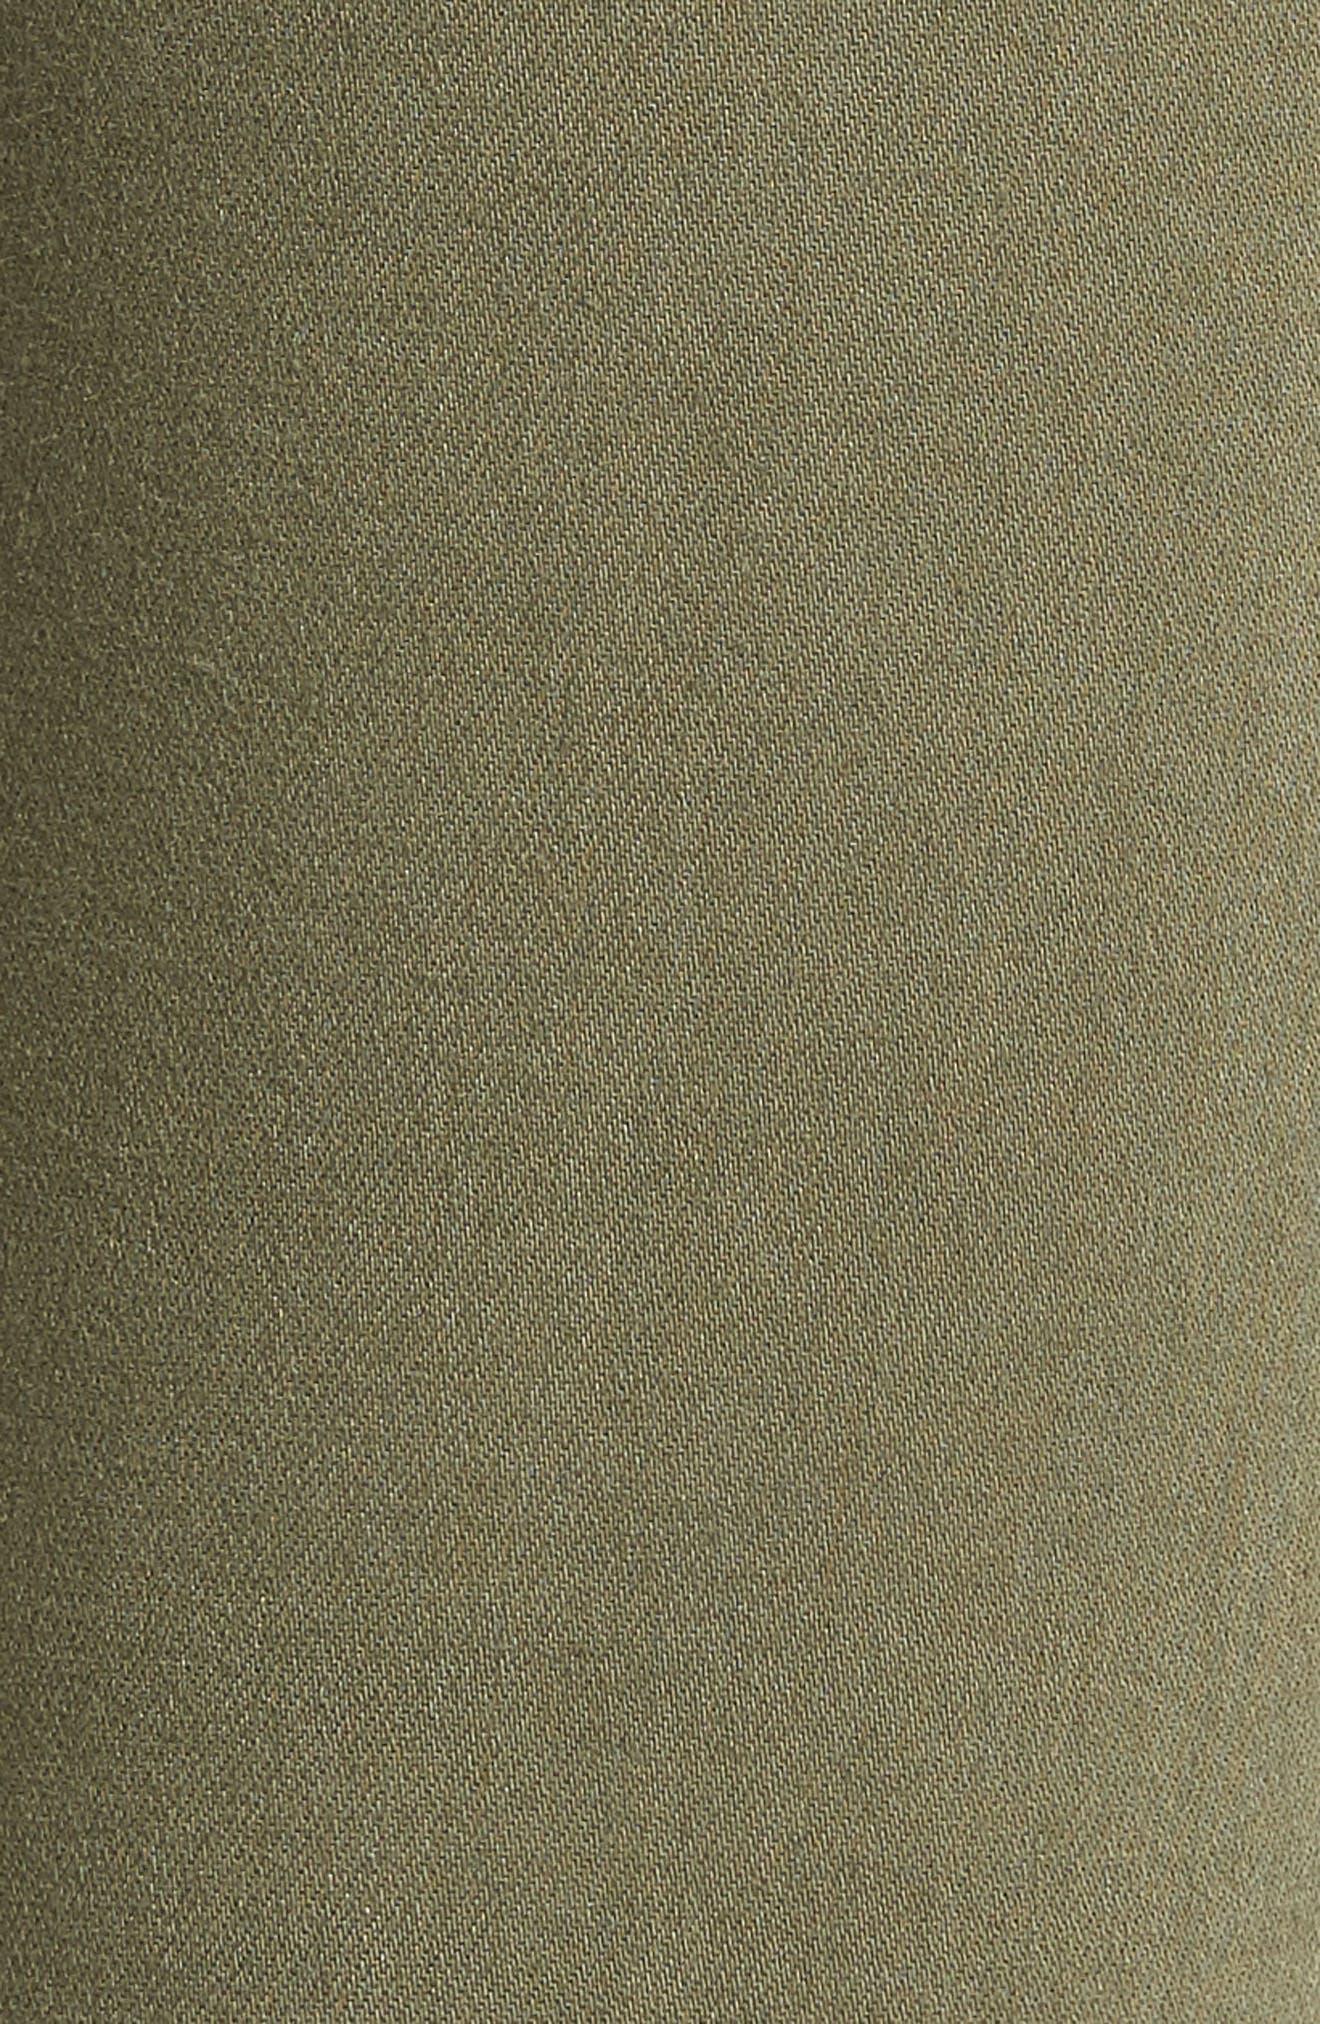 Hoxton High Waist Crop Skinny Jeans,                             Alternate thumbnail 6, color,                             Vintage Green